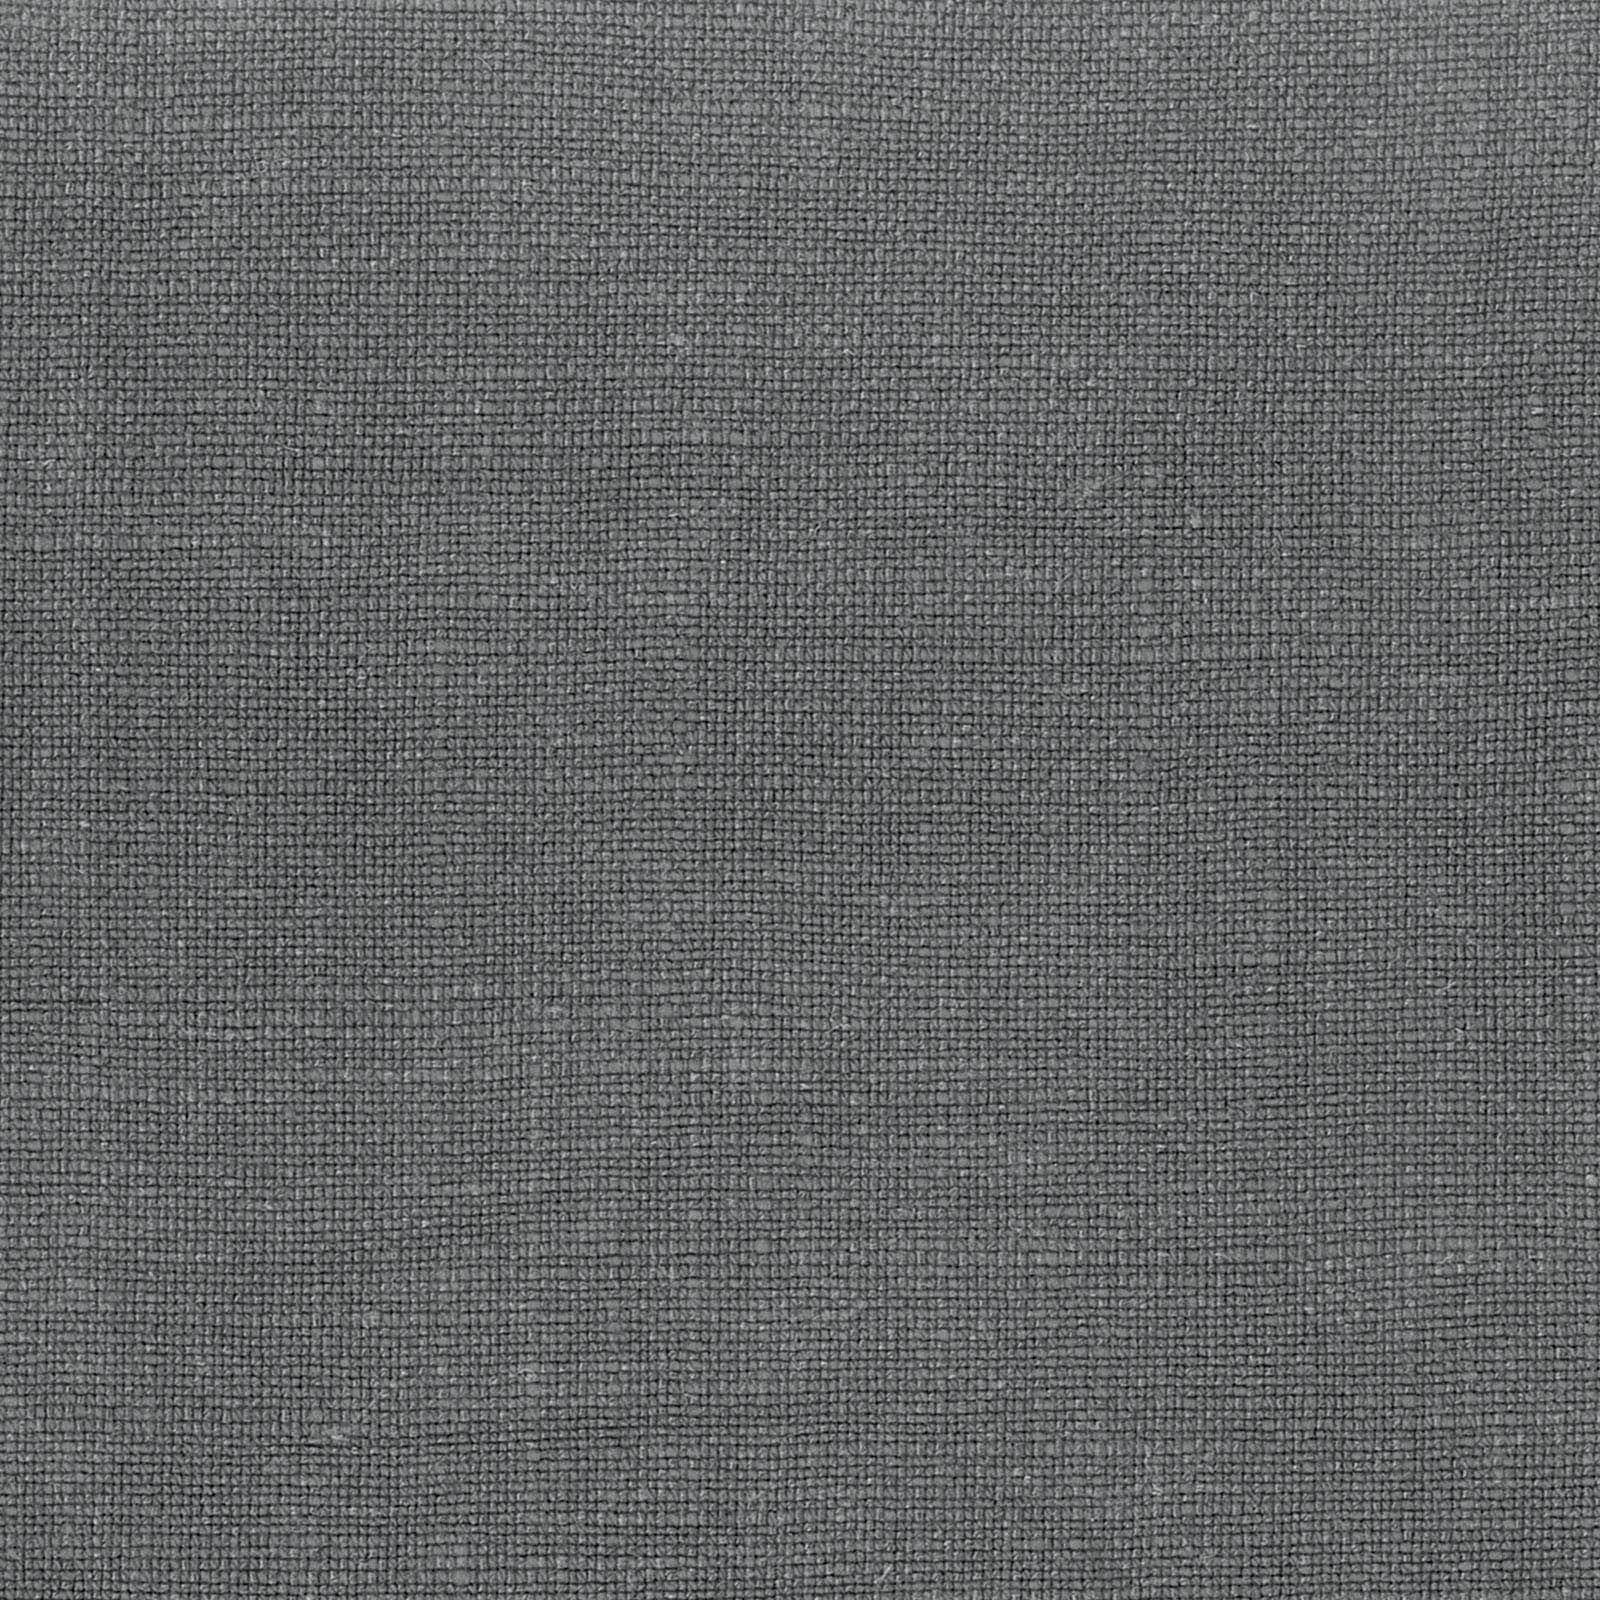 PASSEPARTOUT 17234 - col. 002 - Gris